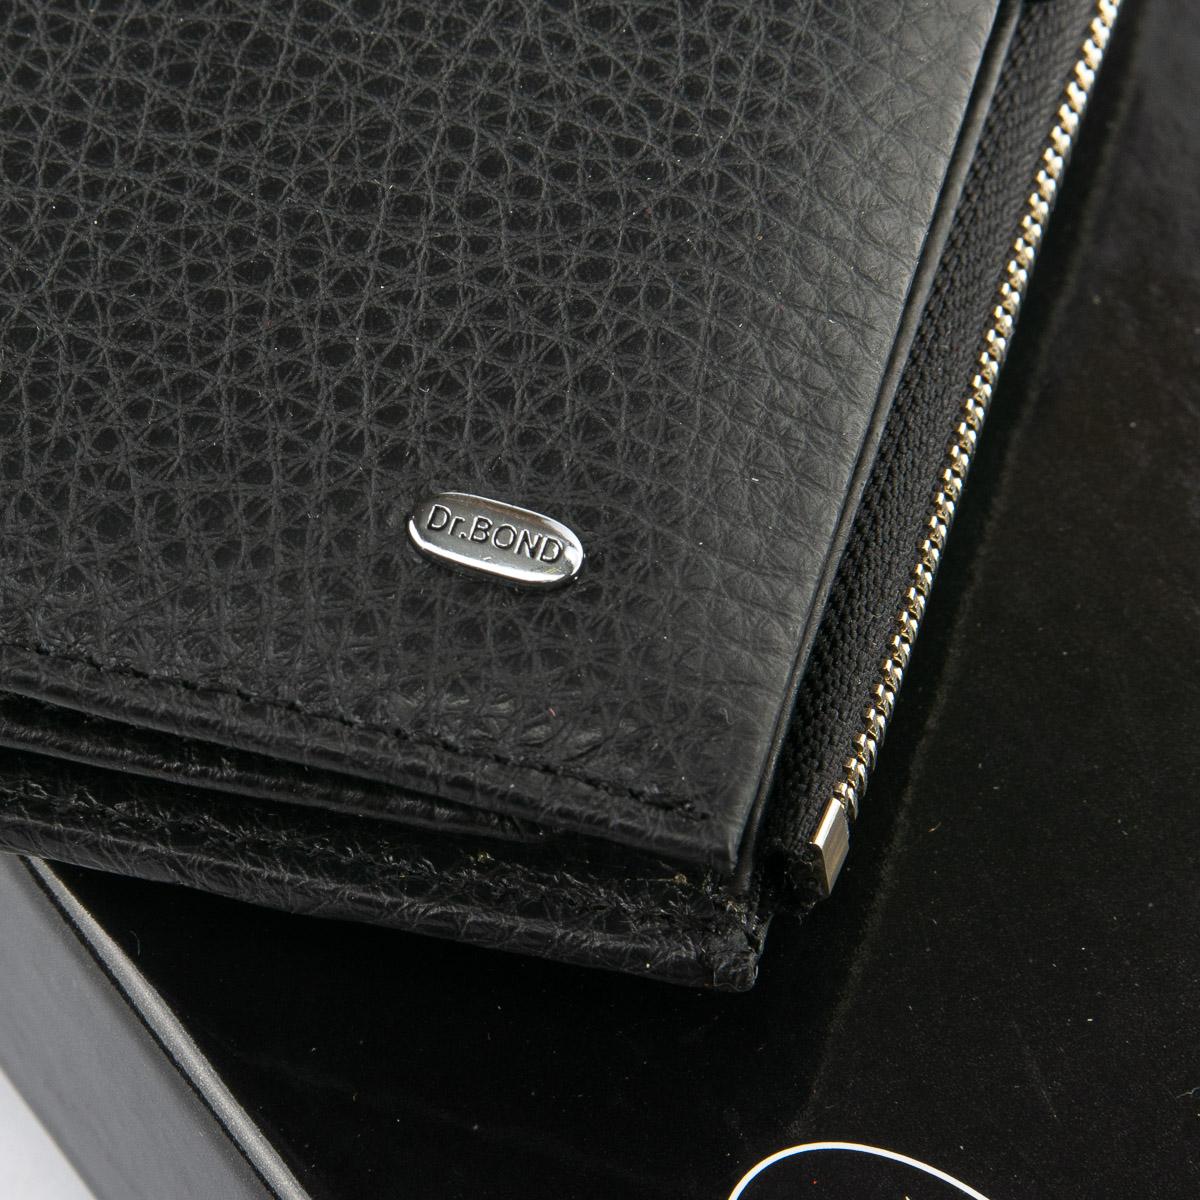 Кошелек Classic кожа DR. BOND WMB-1 black